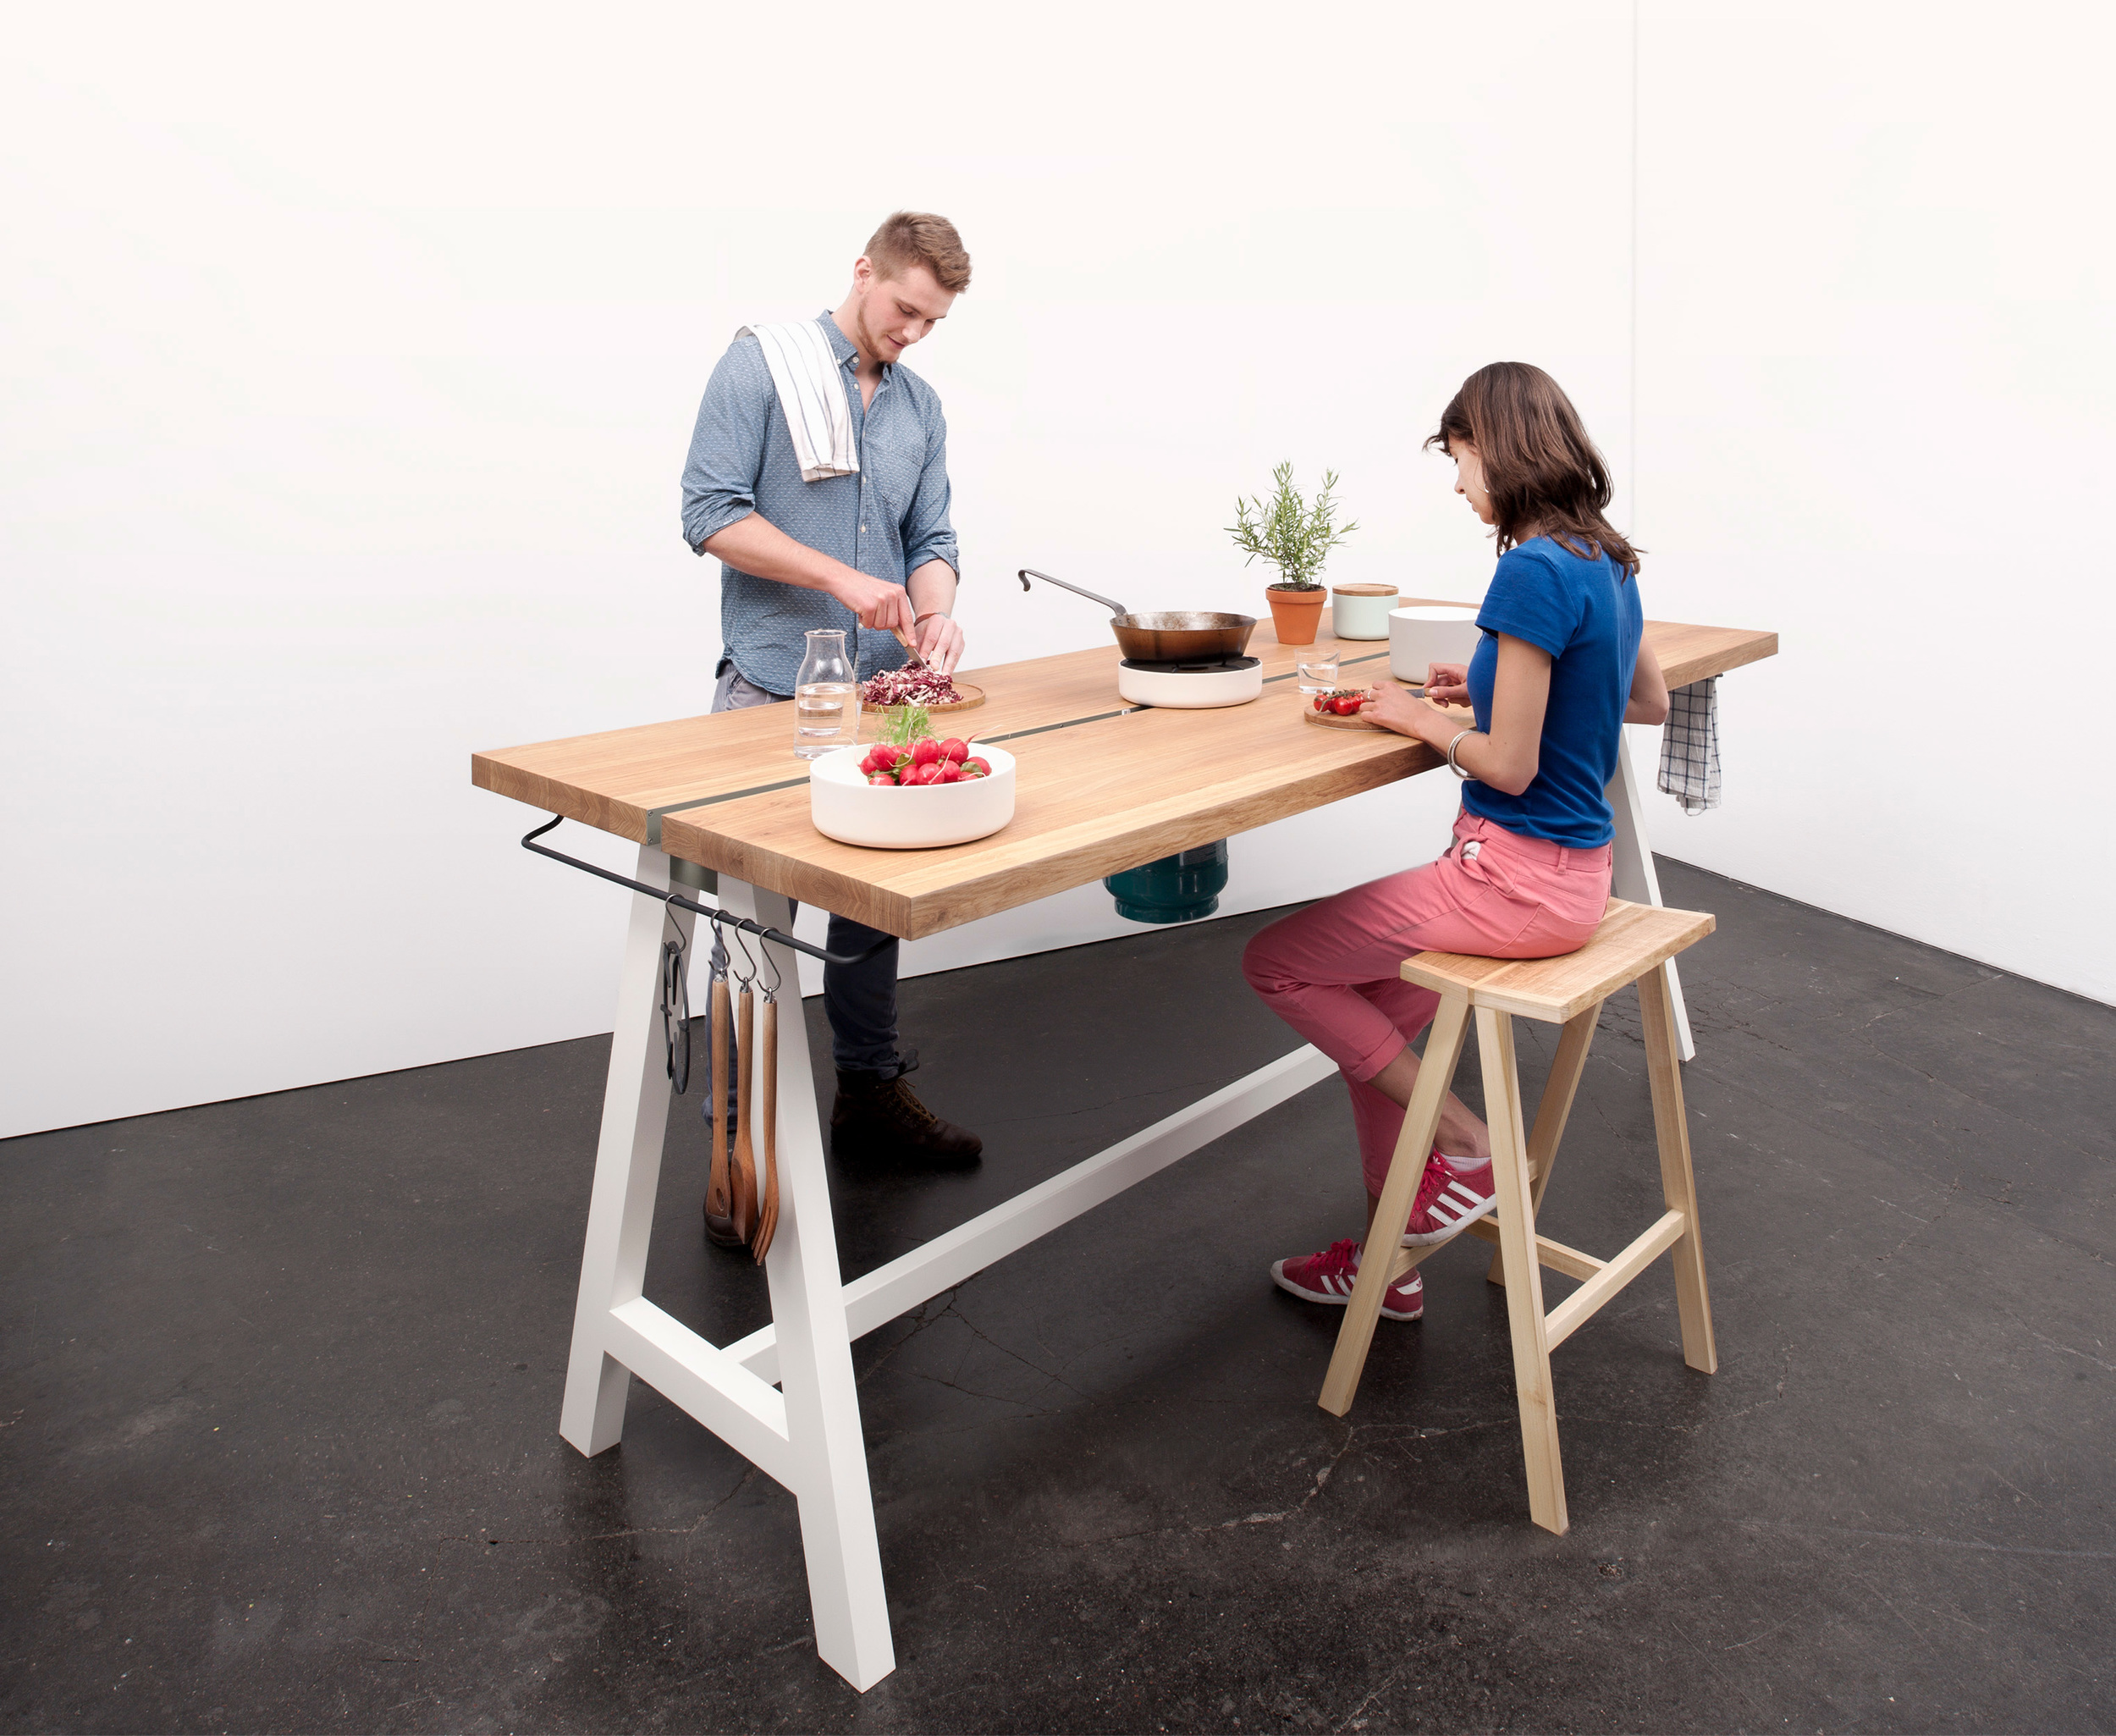 Studio-MoritzPutzier_The-Cooking-Table-15.jpg